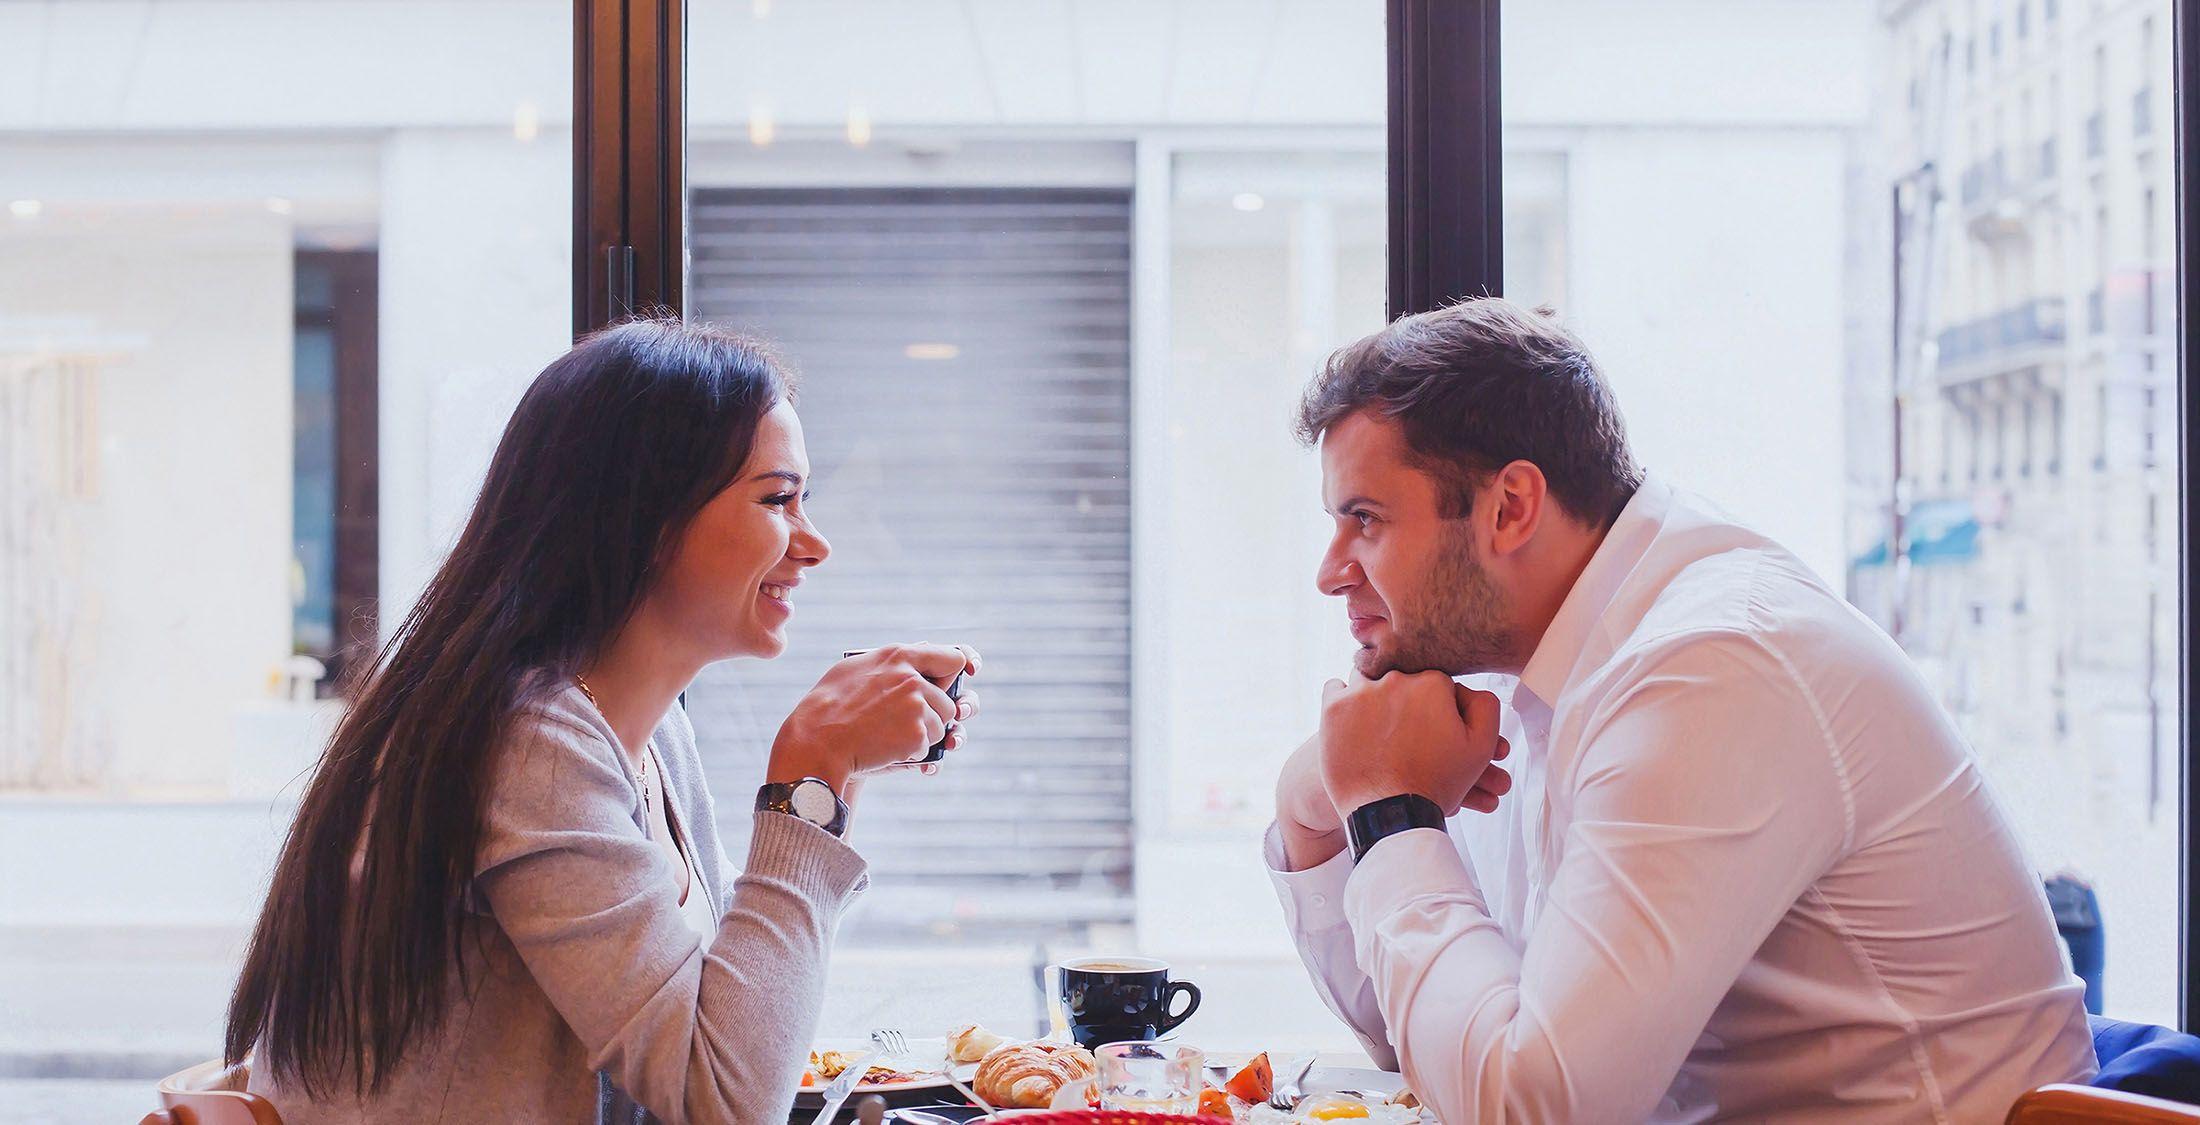 couple on romantic breakfast date